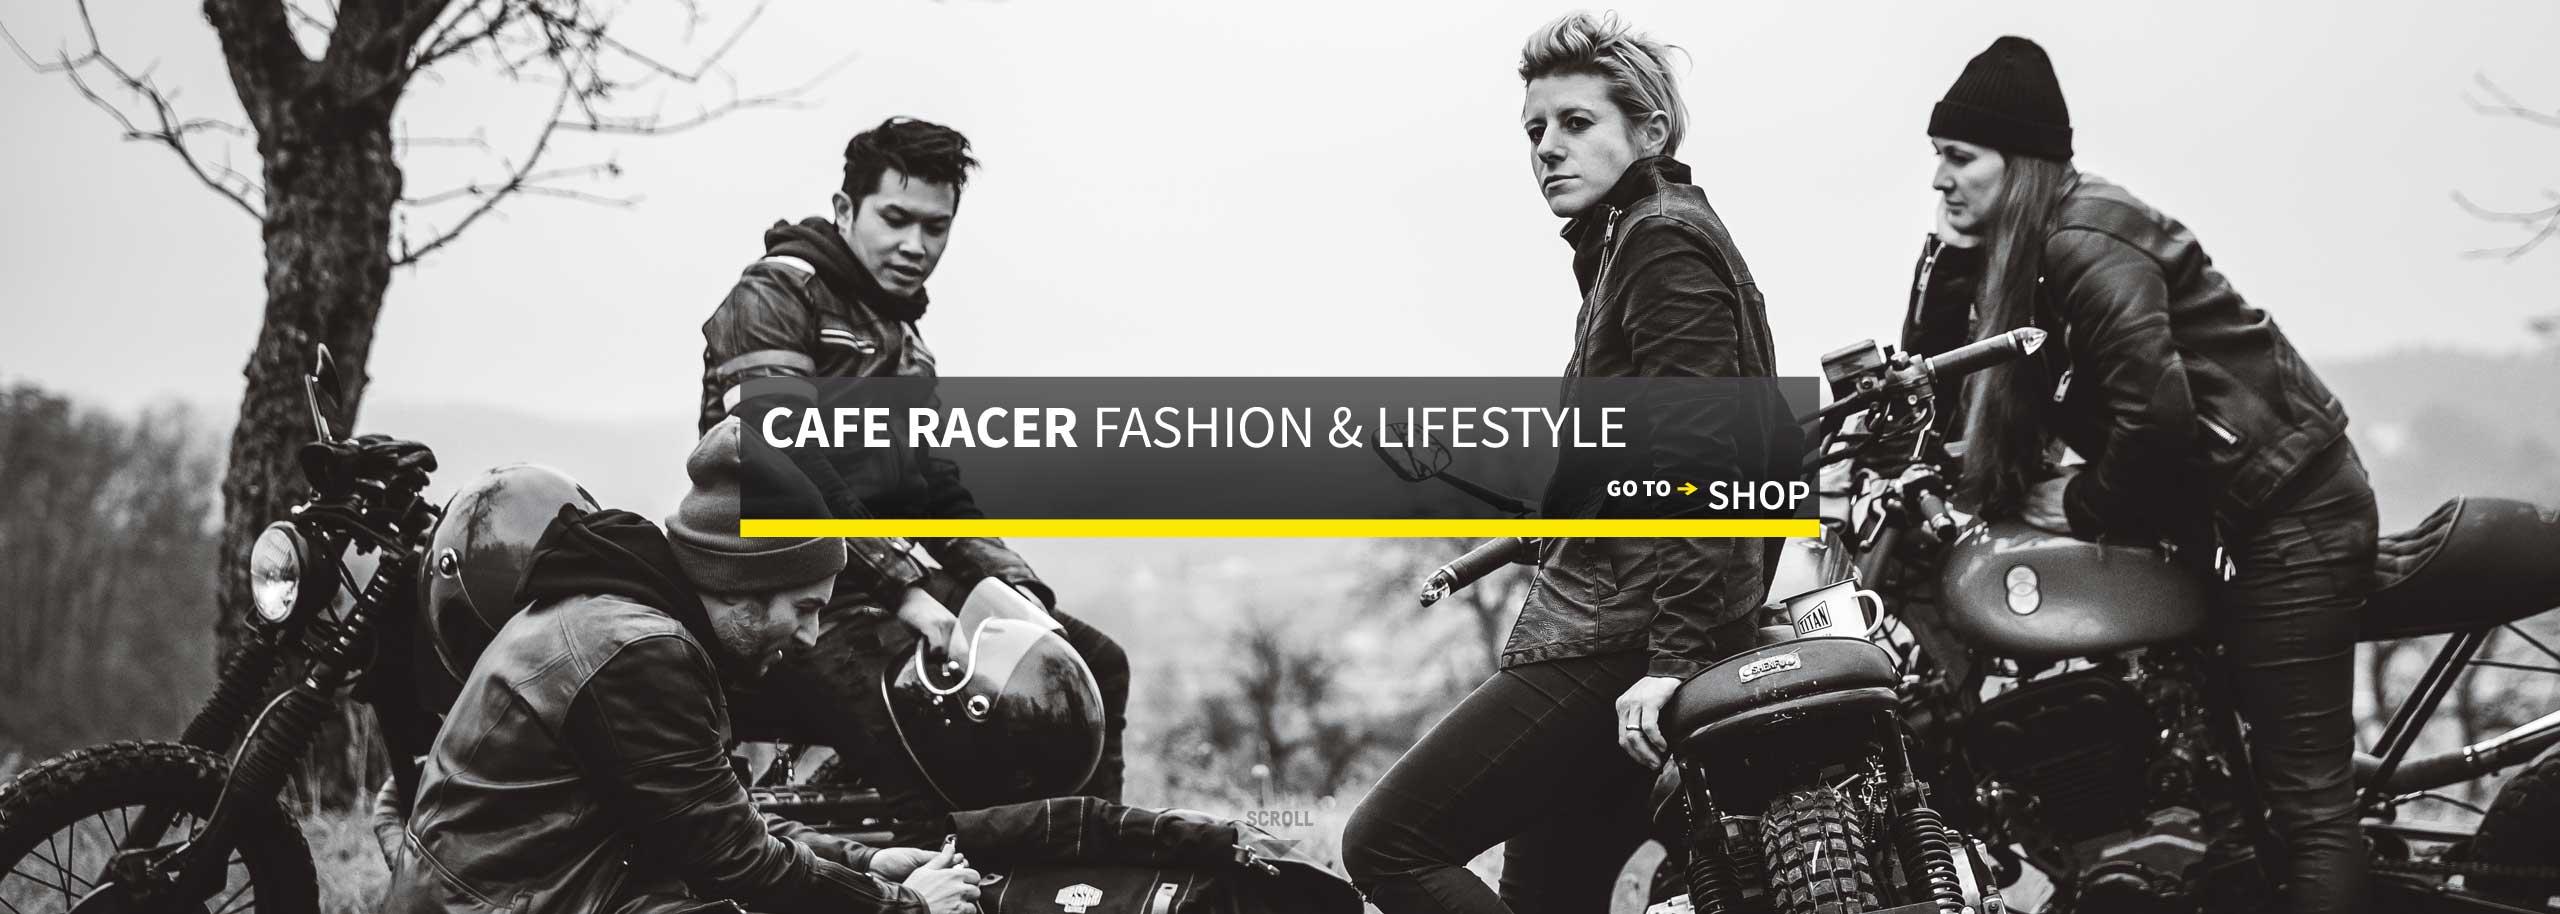 Titan-Motorcycles_CafeRacer-Shop-Online-Store-Bores-Lifestyle-Fashion-CustomBike-Graz-Austria-Bores-Wachsjacke-Lumberjack-Österreich-Belstaff-Biltwell-Wasserstoff